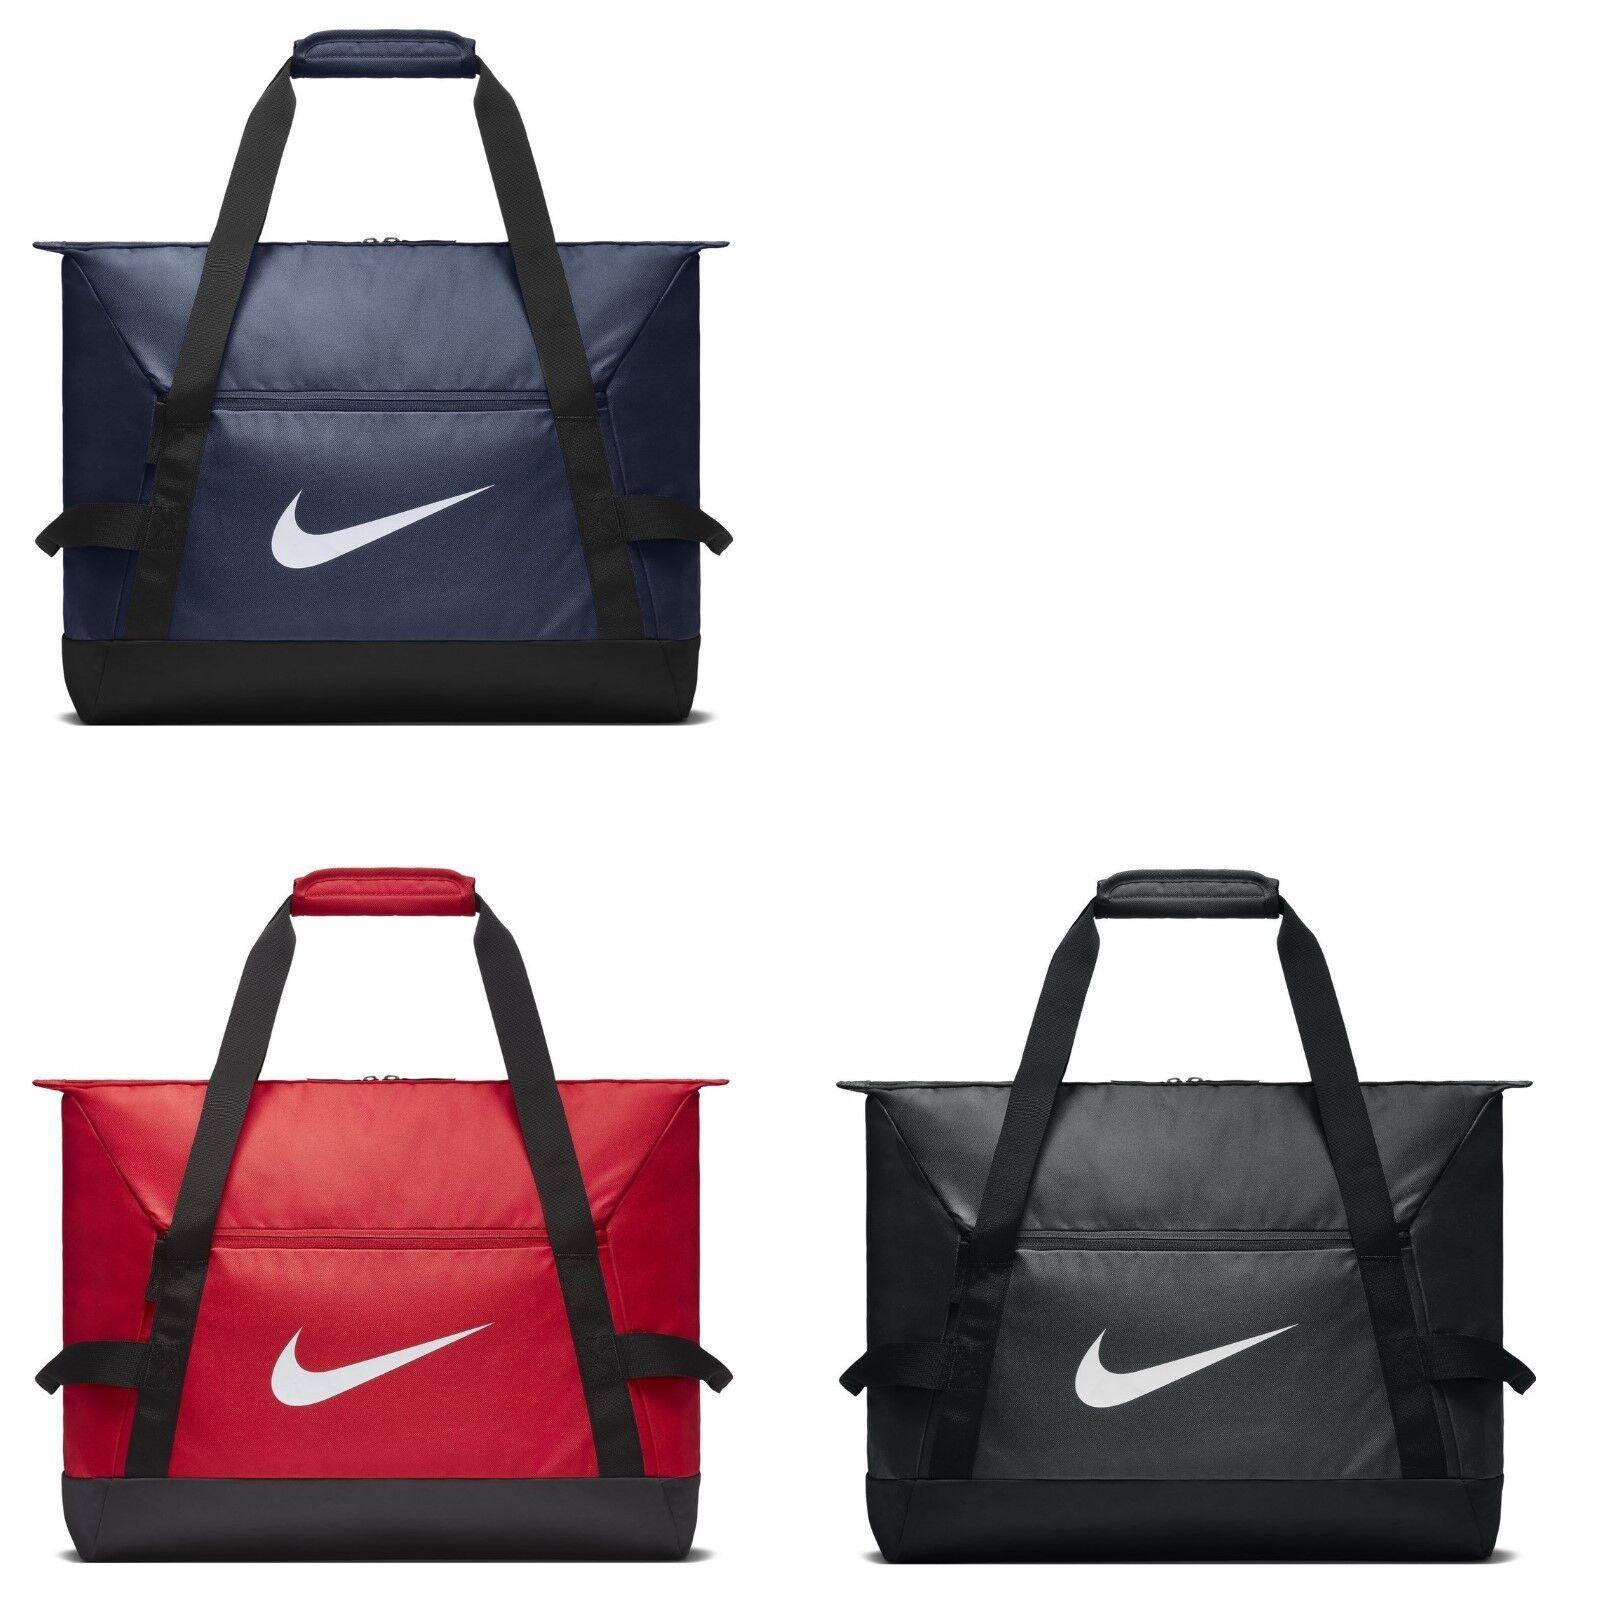 9584e657af63a Nike Trainings Tasche Test Vergleich +++ Nike Trainings Tasche ...